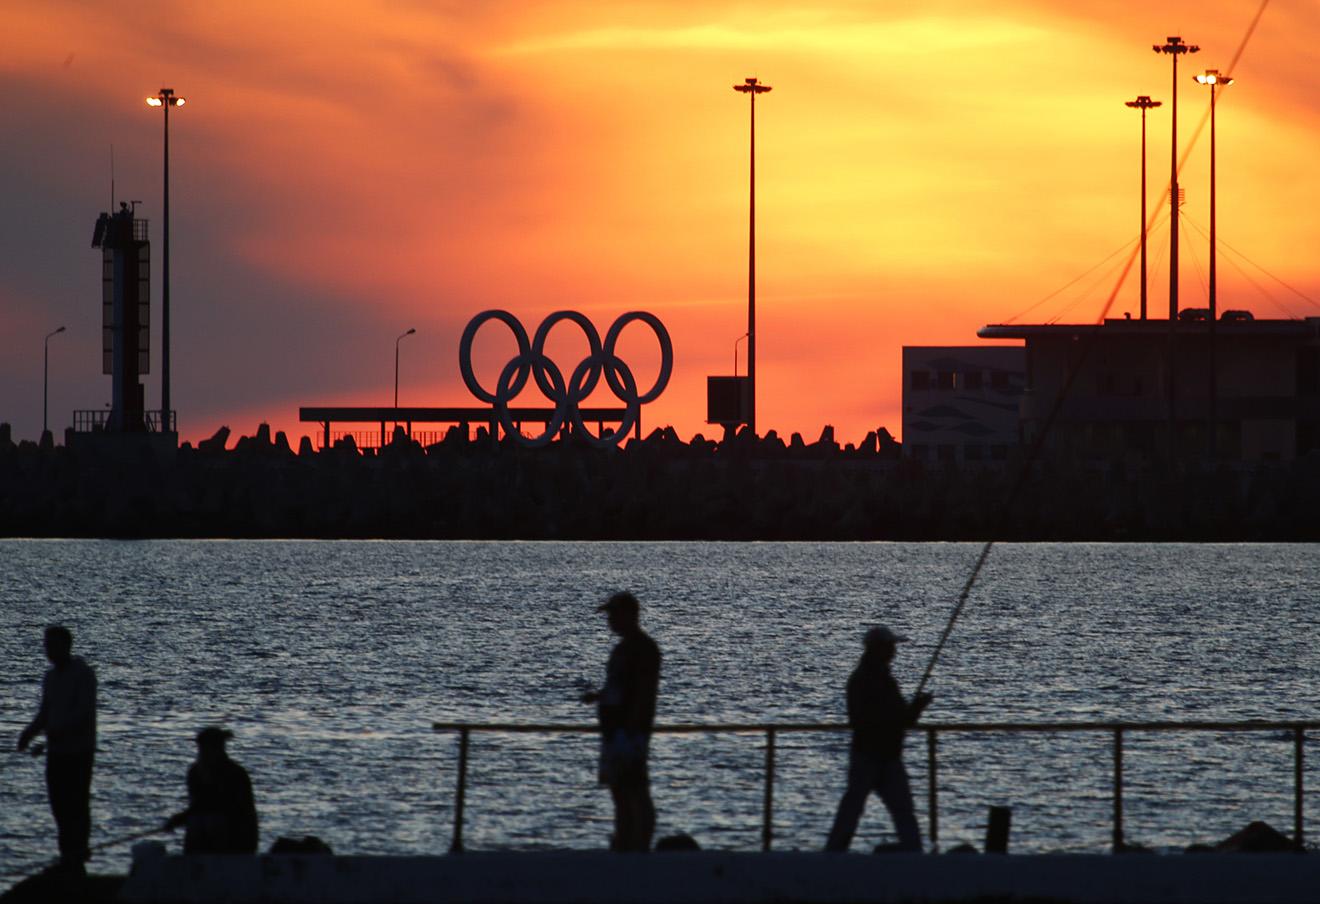 Вид на Олимпийские кольца на набережной Сочи.